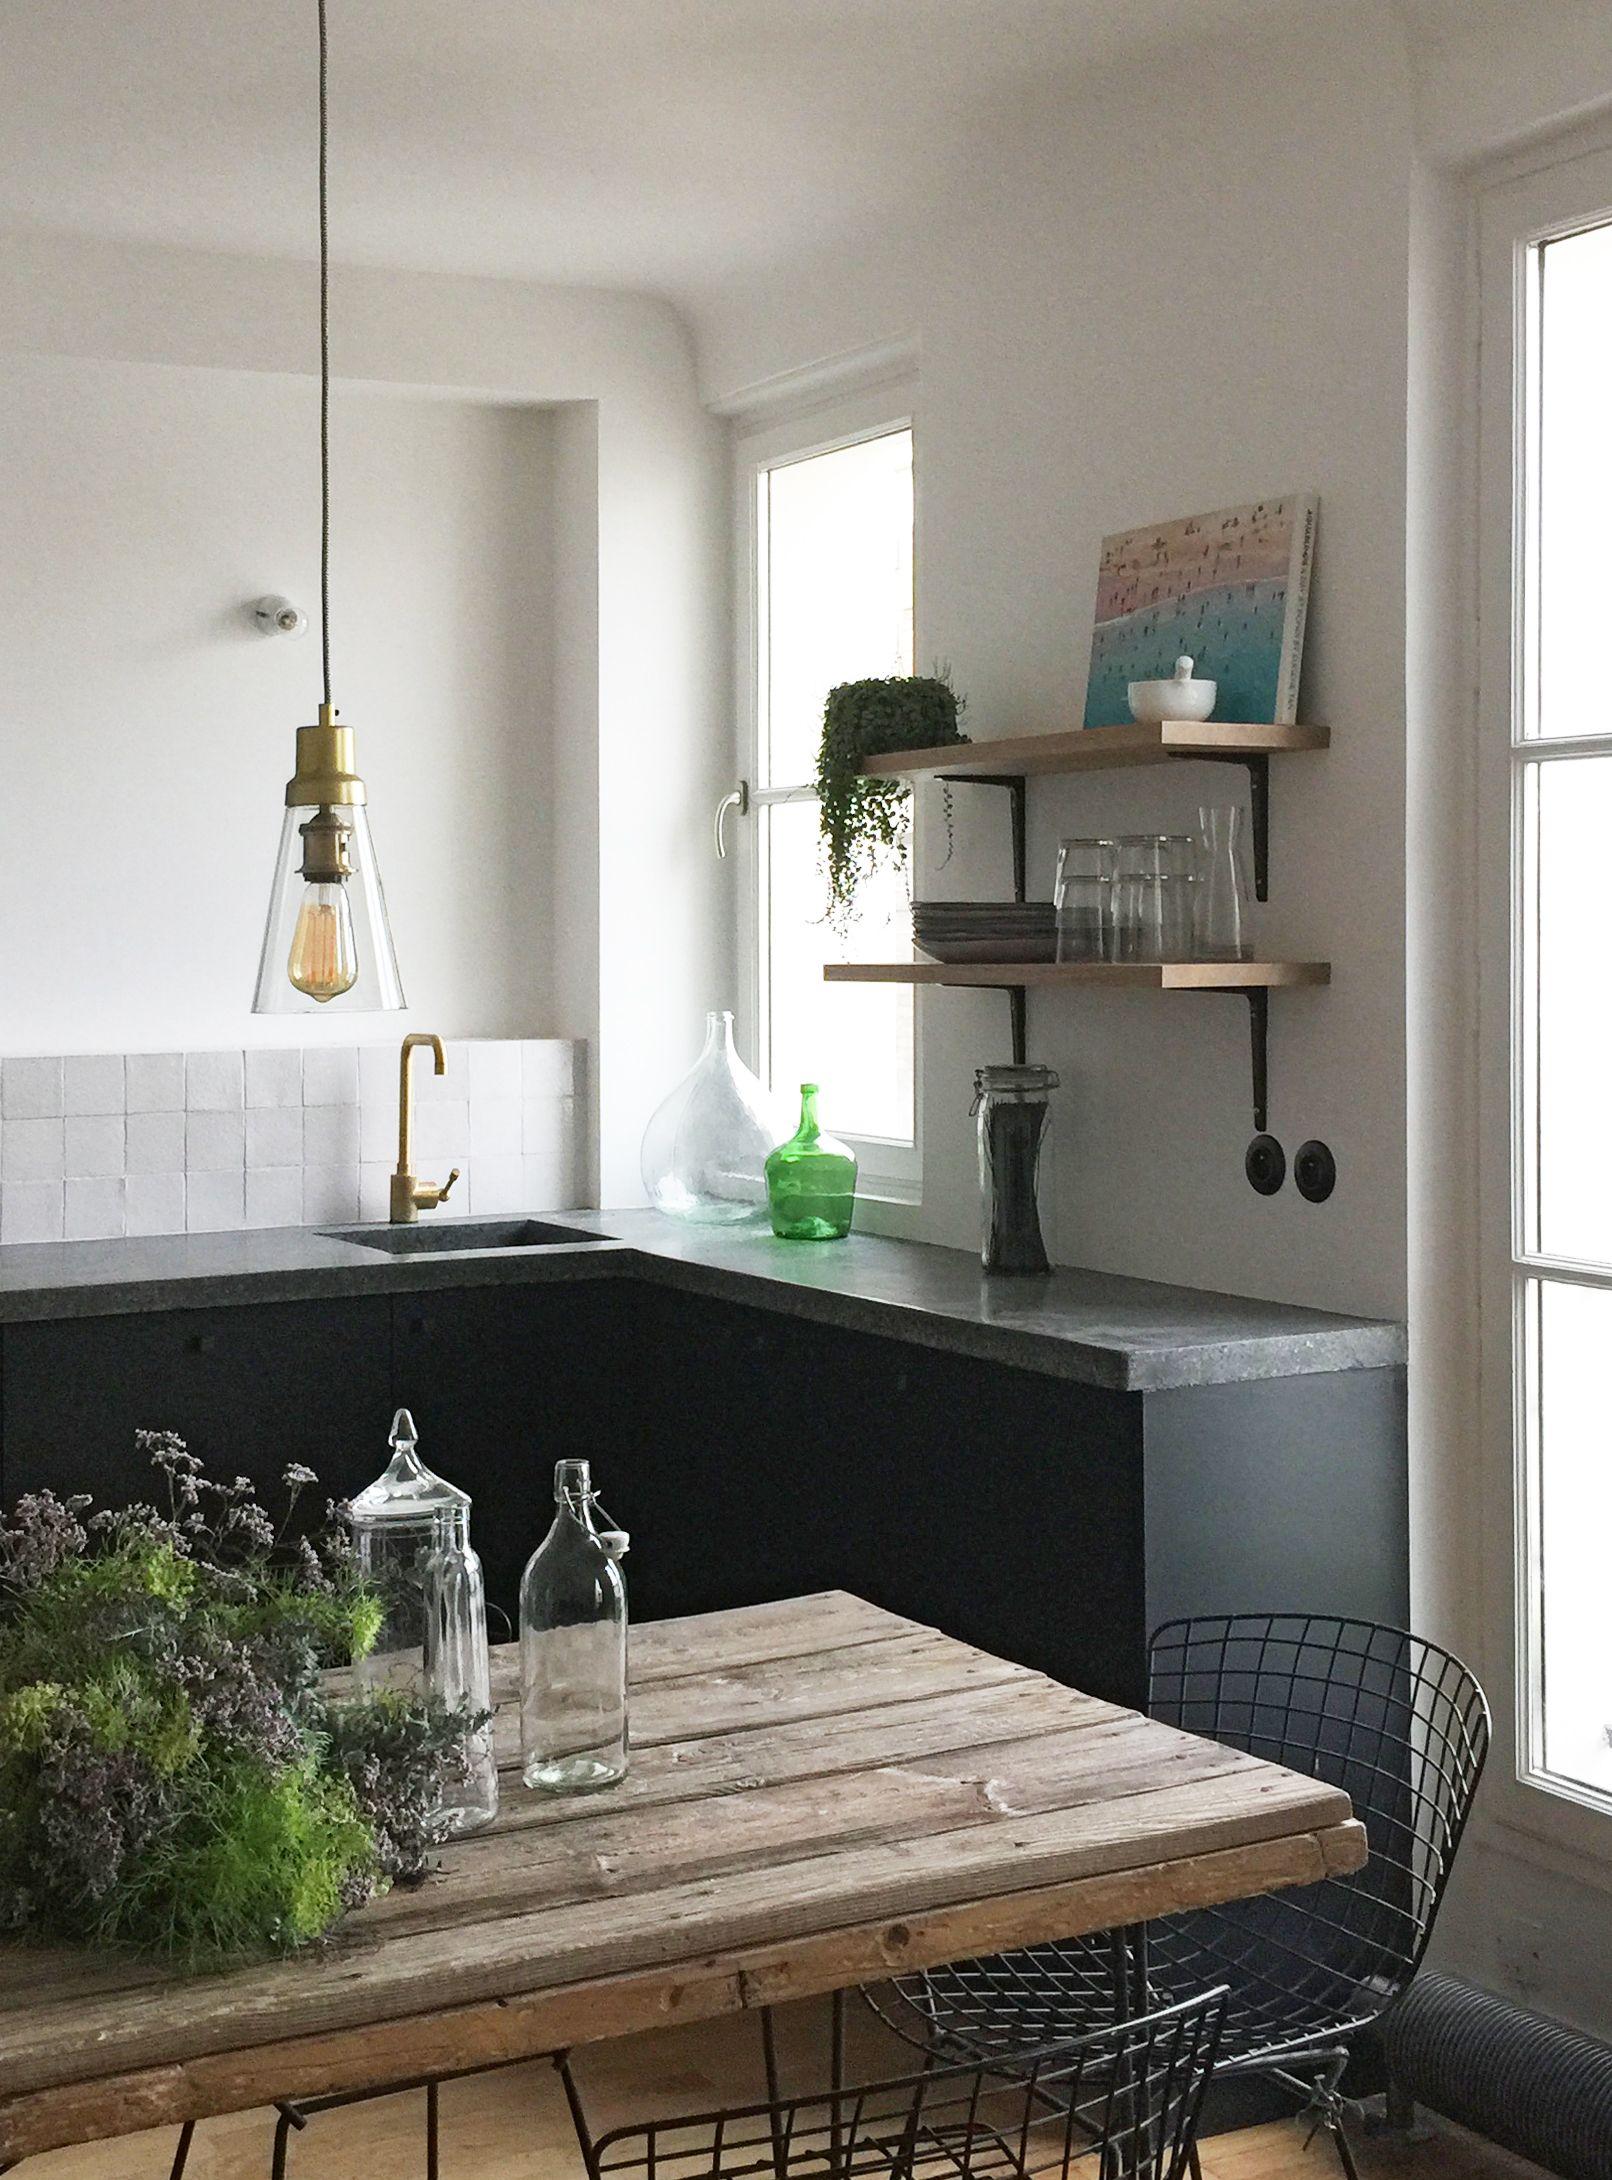 cuisine noire black kitchen bertoai plan de travail counter top terrazzo mitigeur laiton brass. Black Bedroom Furniture Sets. Home Design Ideas